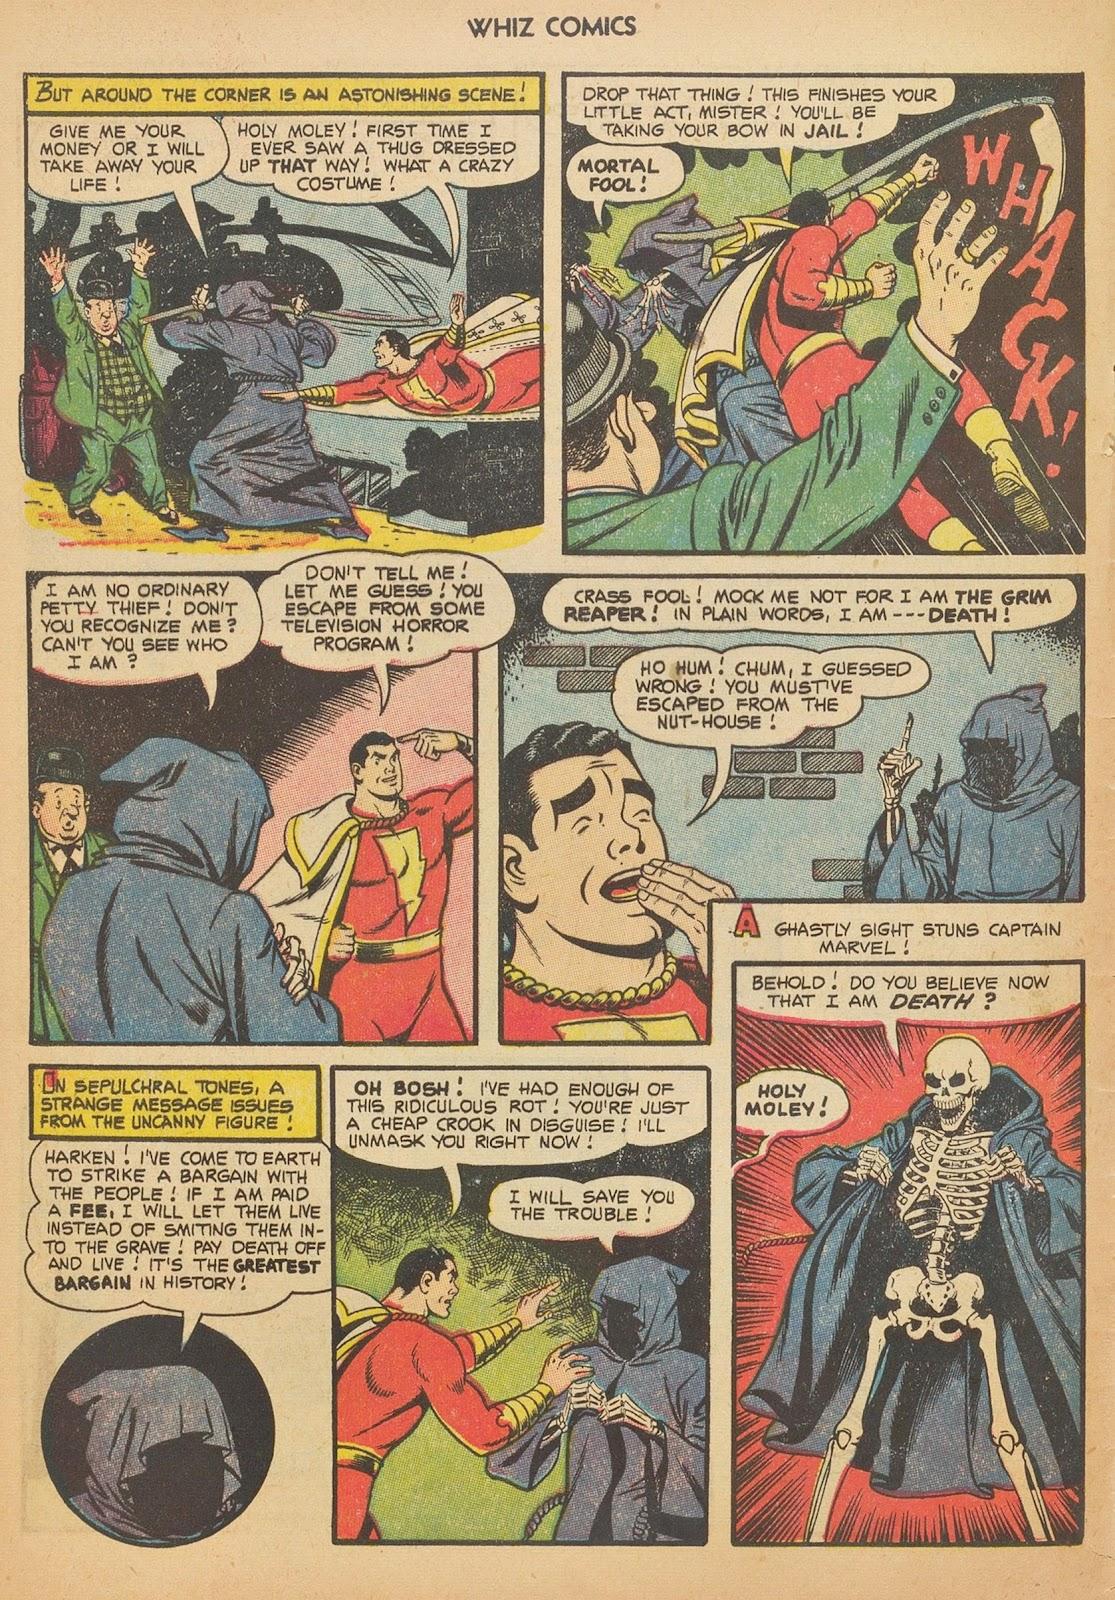 Read online WHIZ Comics comic -  Issue #153 - 4